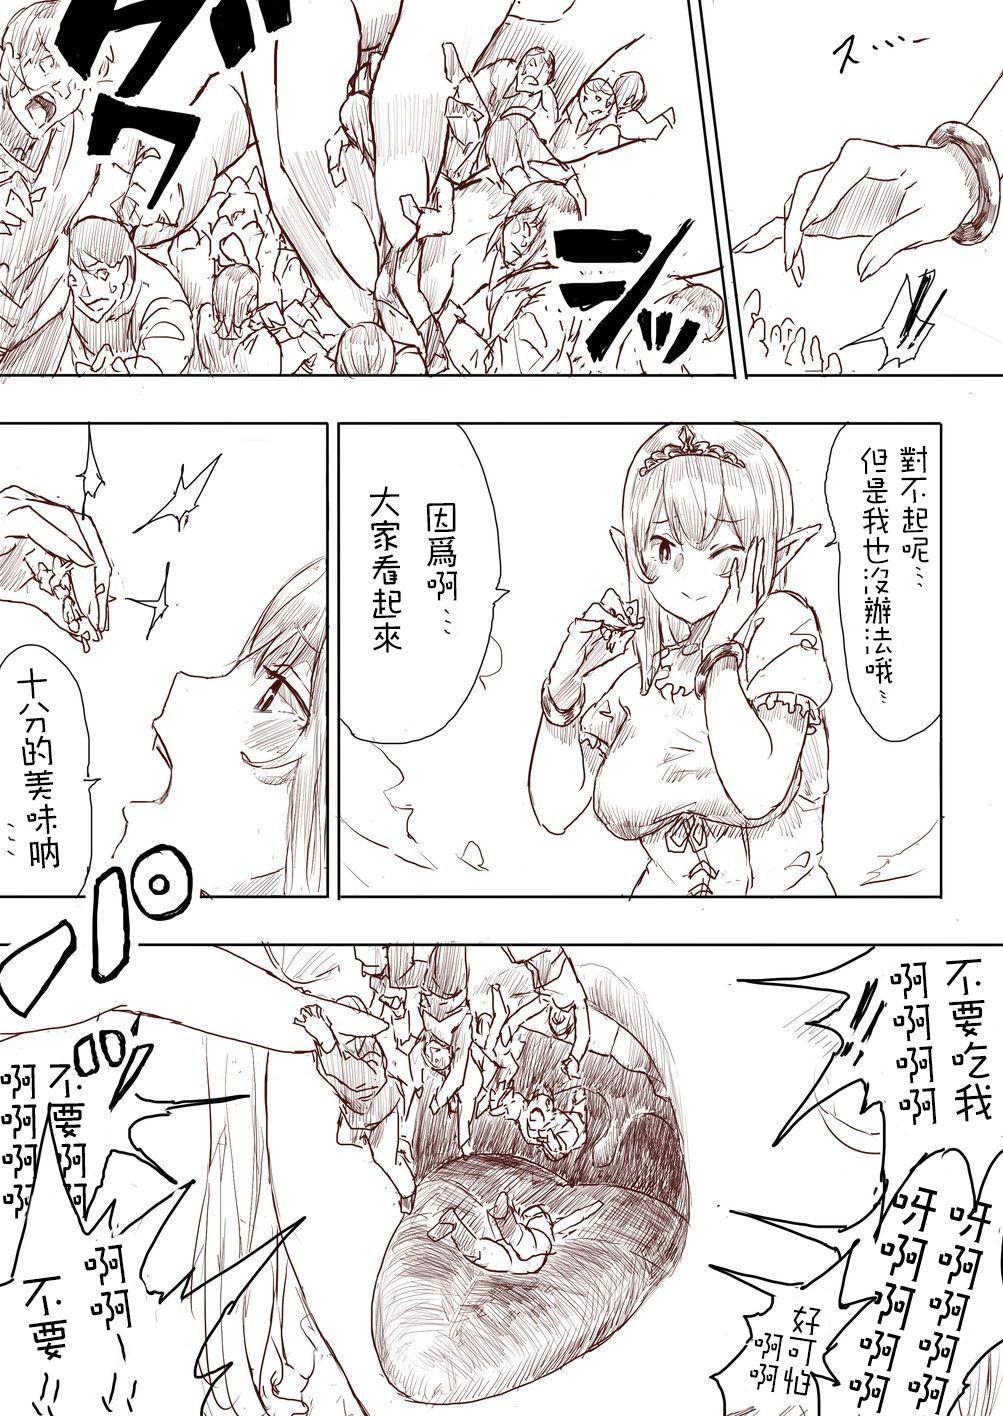 Elf Princess Strikes Back Part1 126